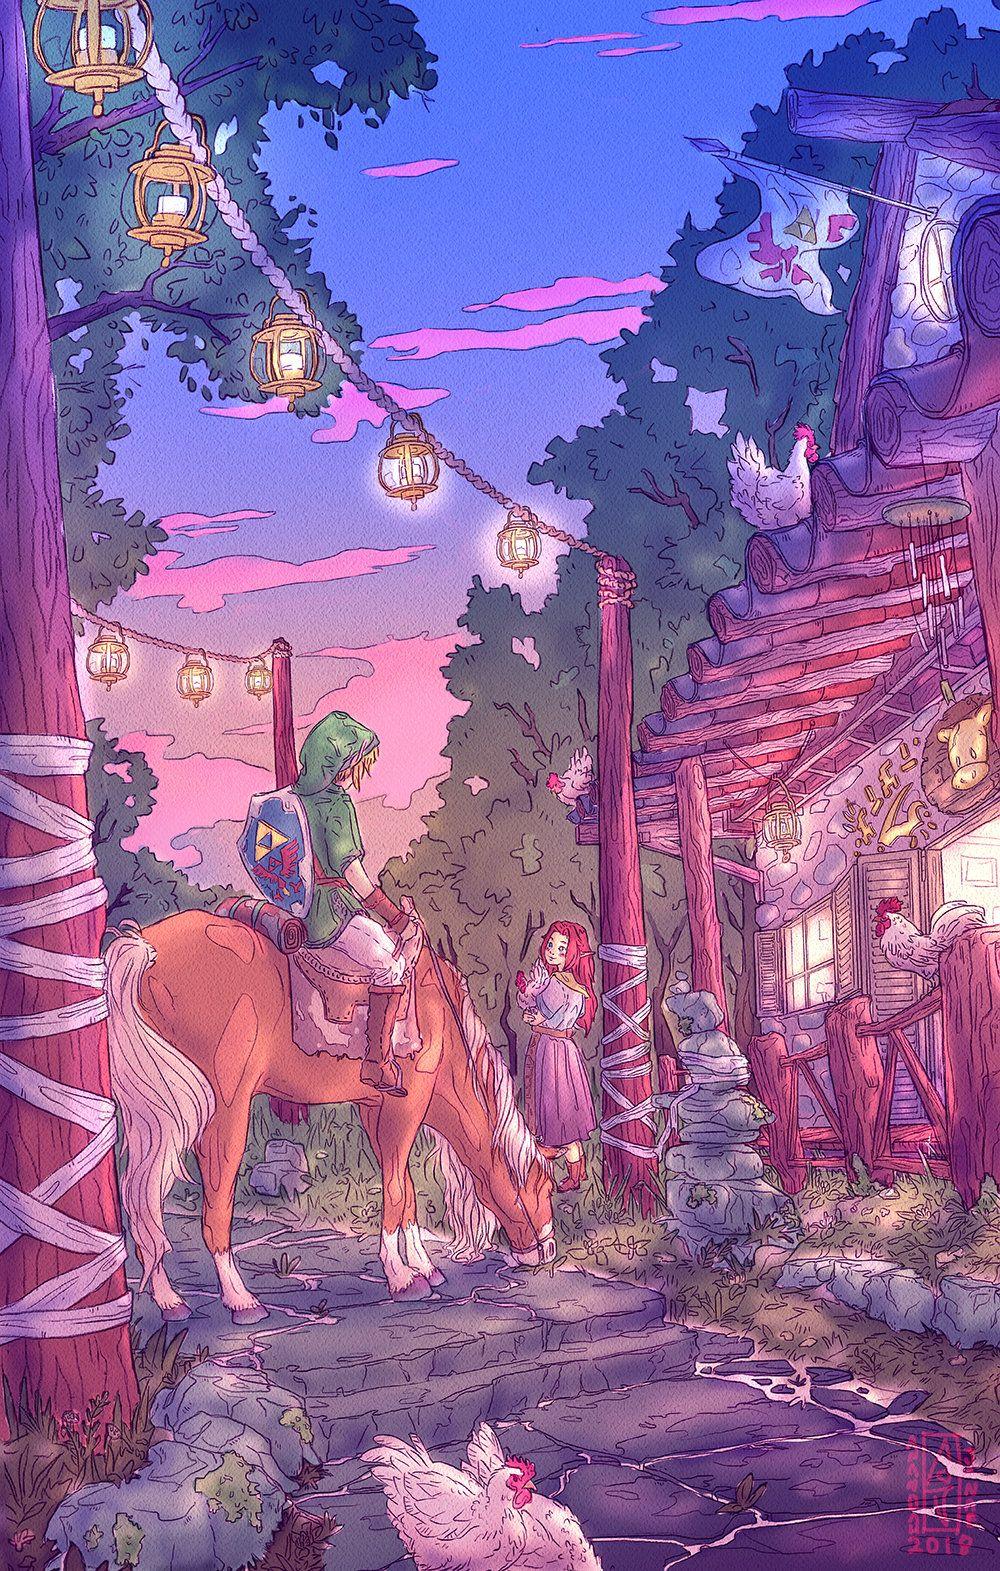 Legend Of Zelda Link And Malon At Lon Lon Ranch Fan Art Print Etsy Zelda Art Zelda Drawing Legend Of Zelda